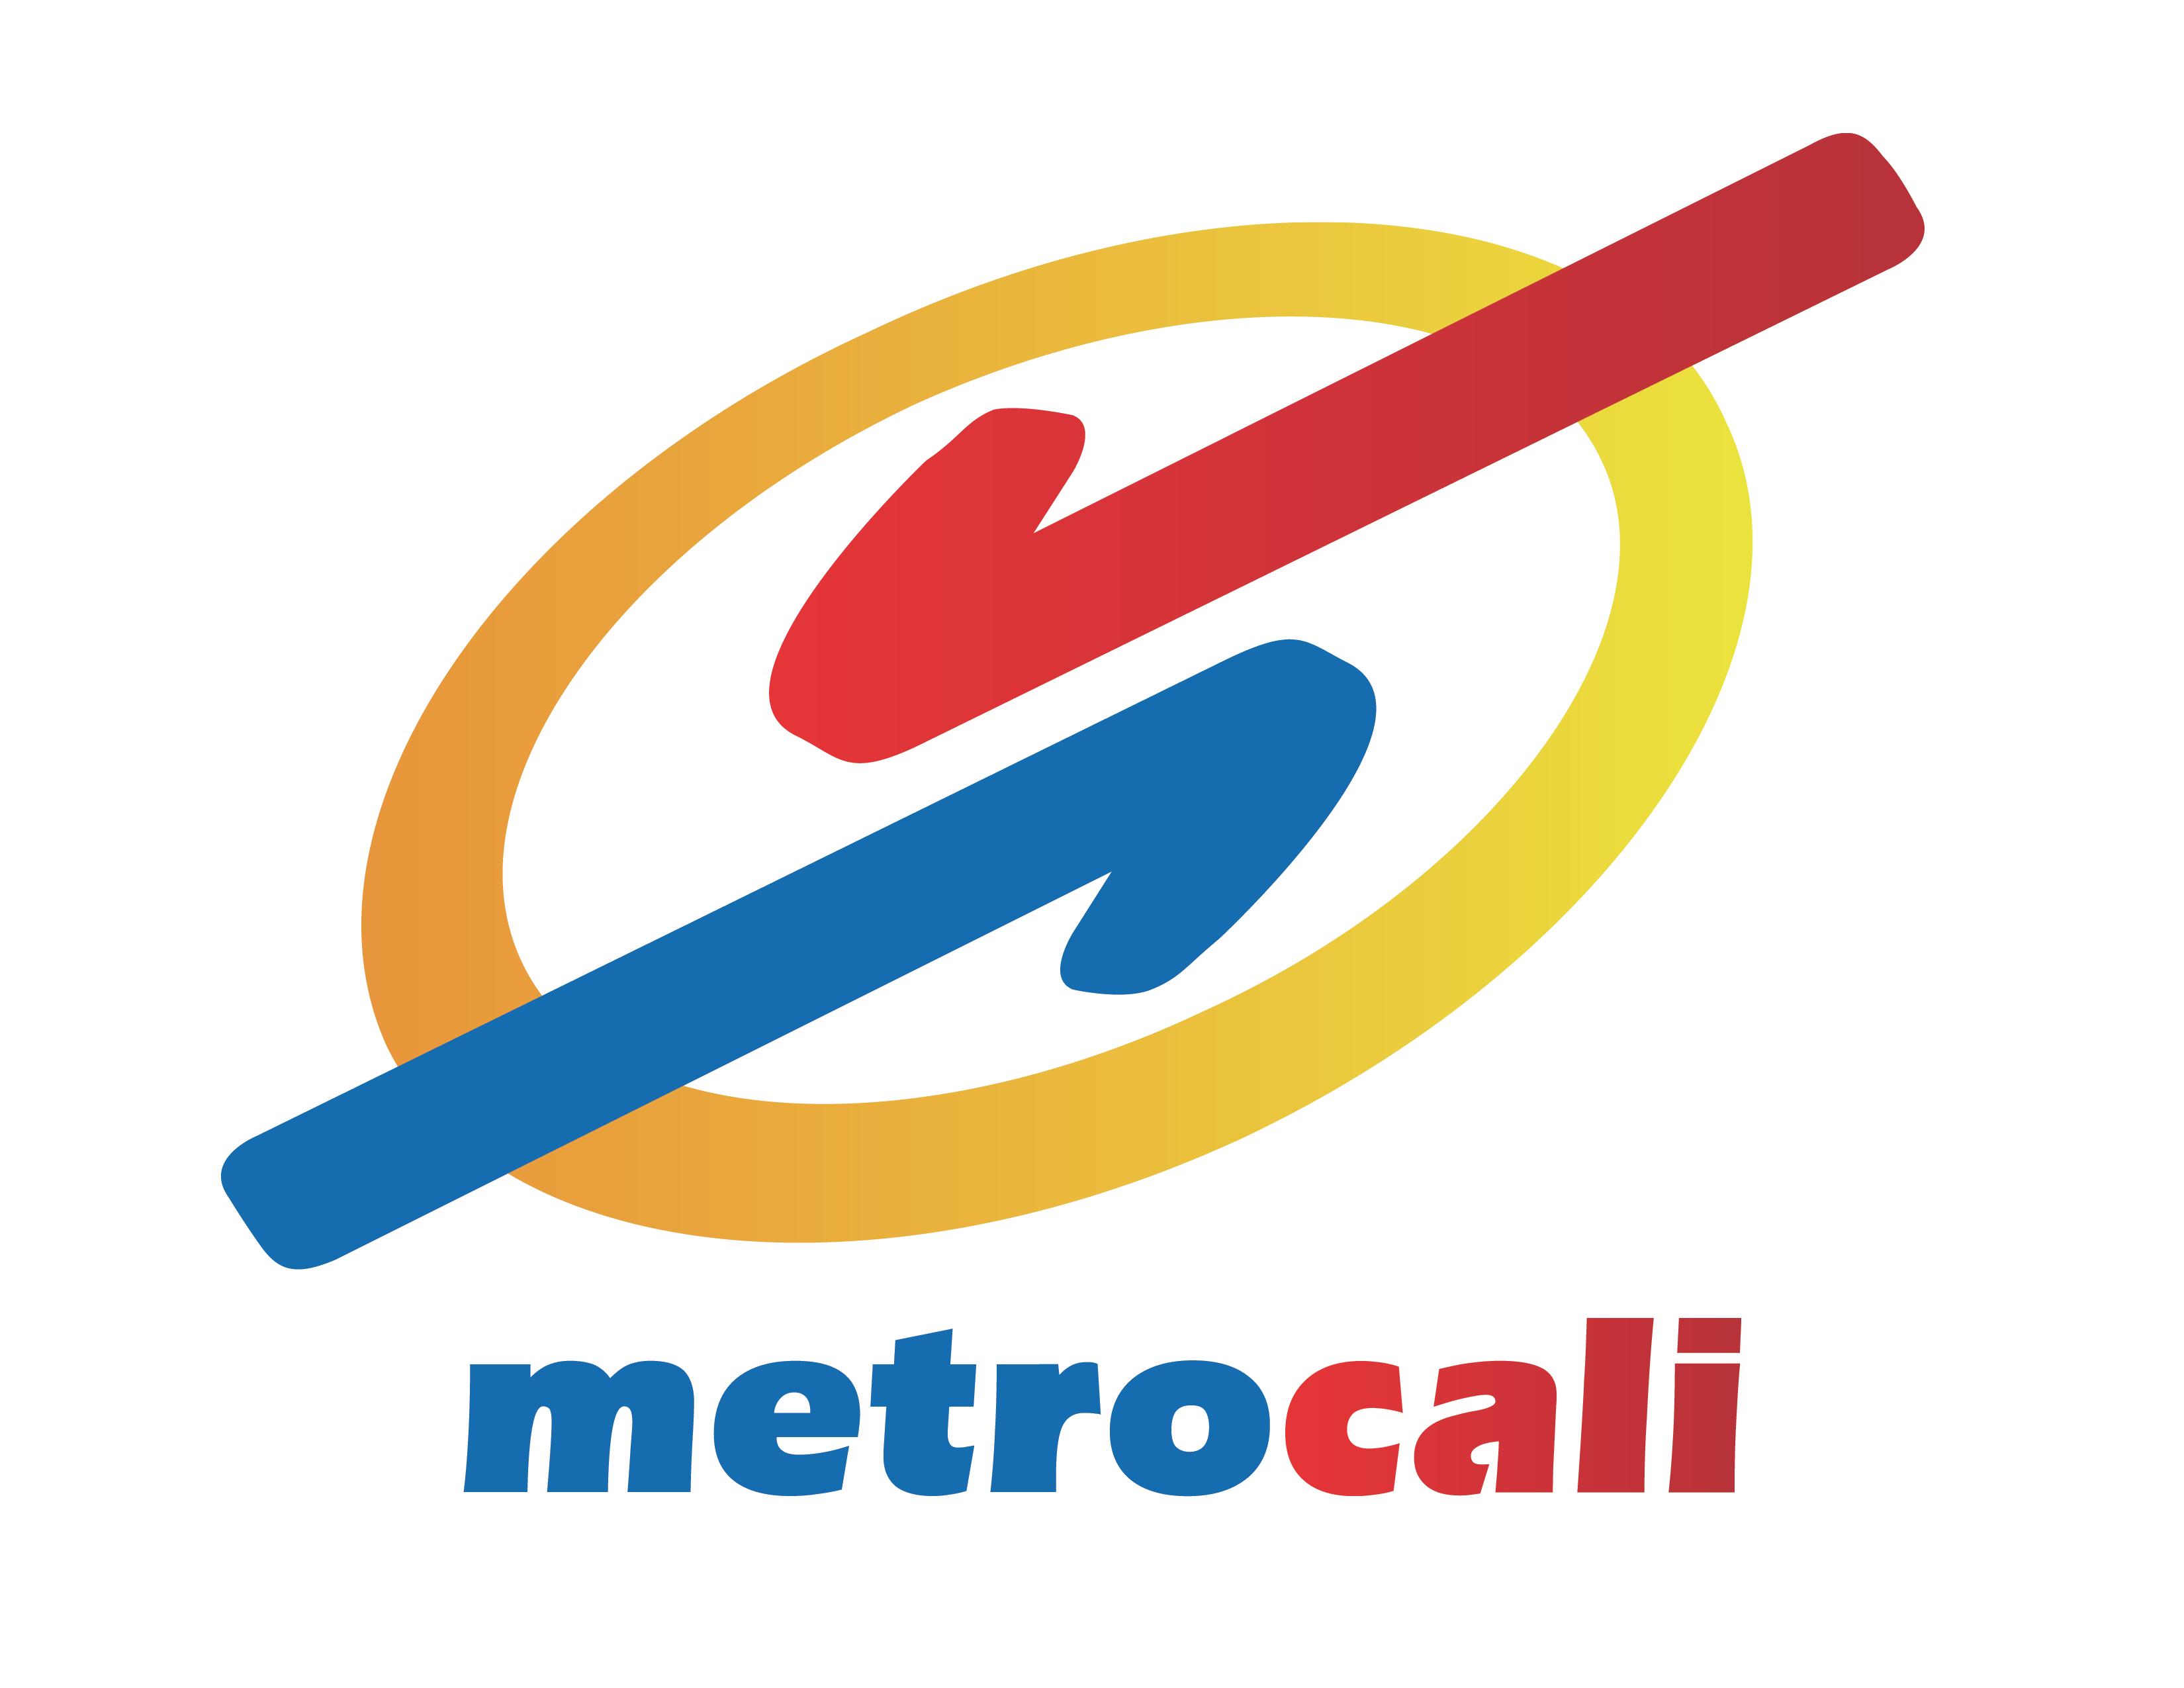 METROCALI